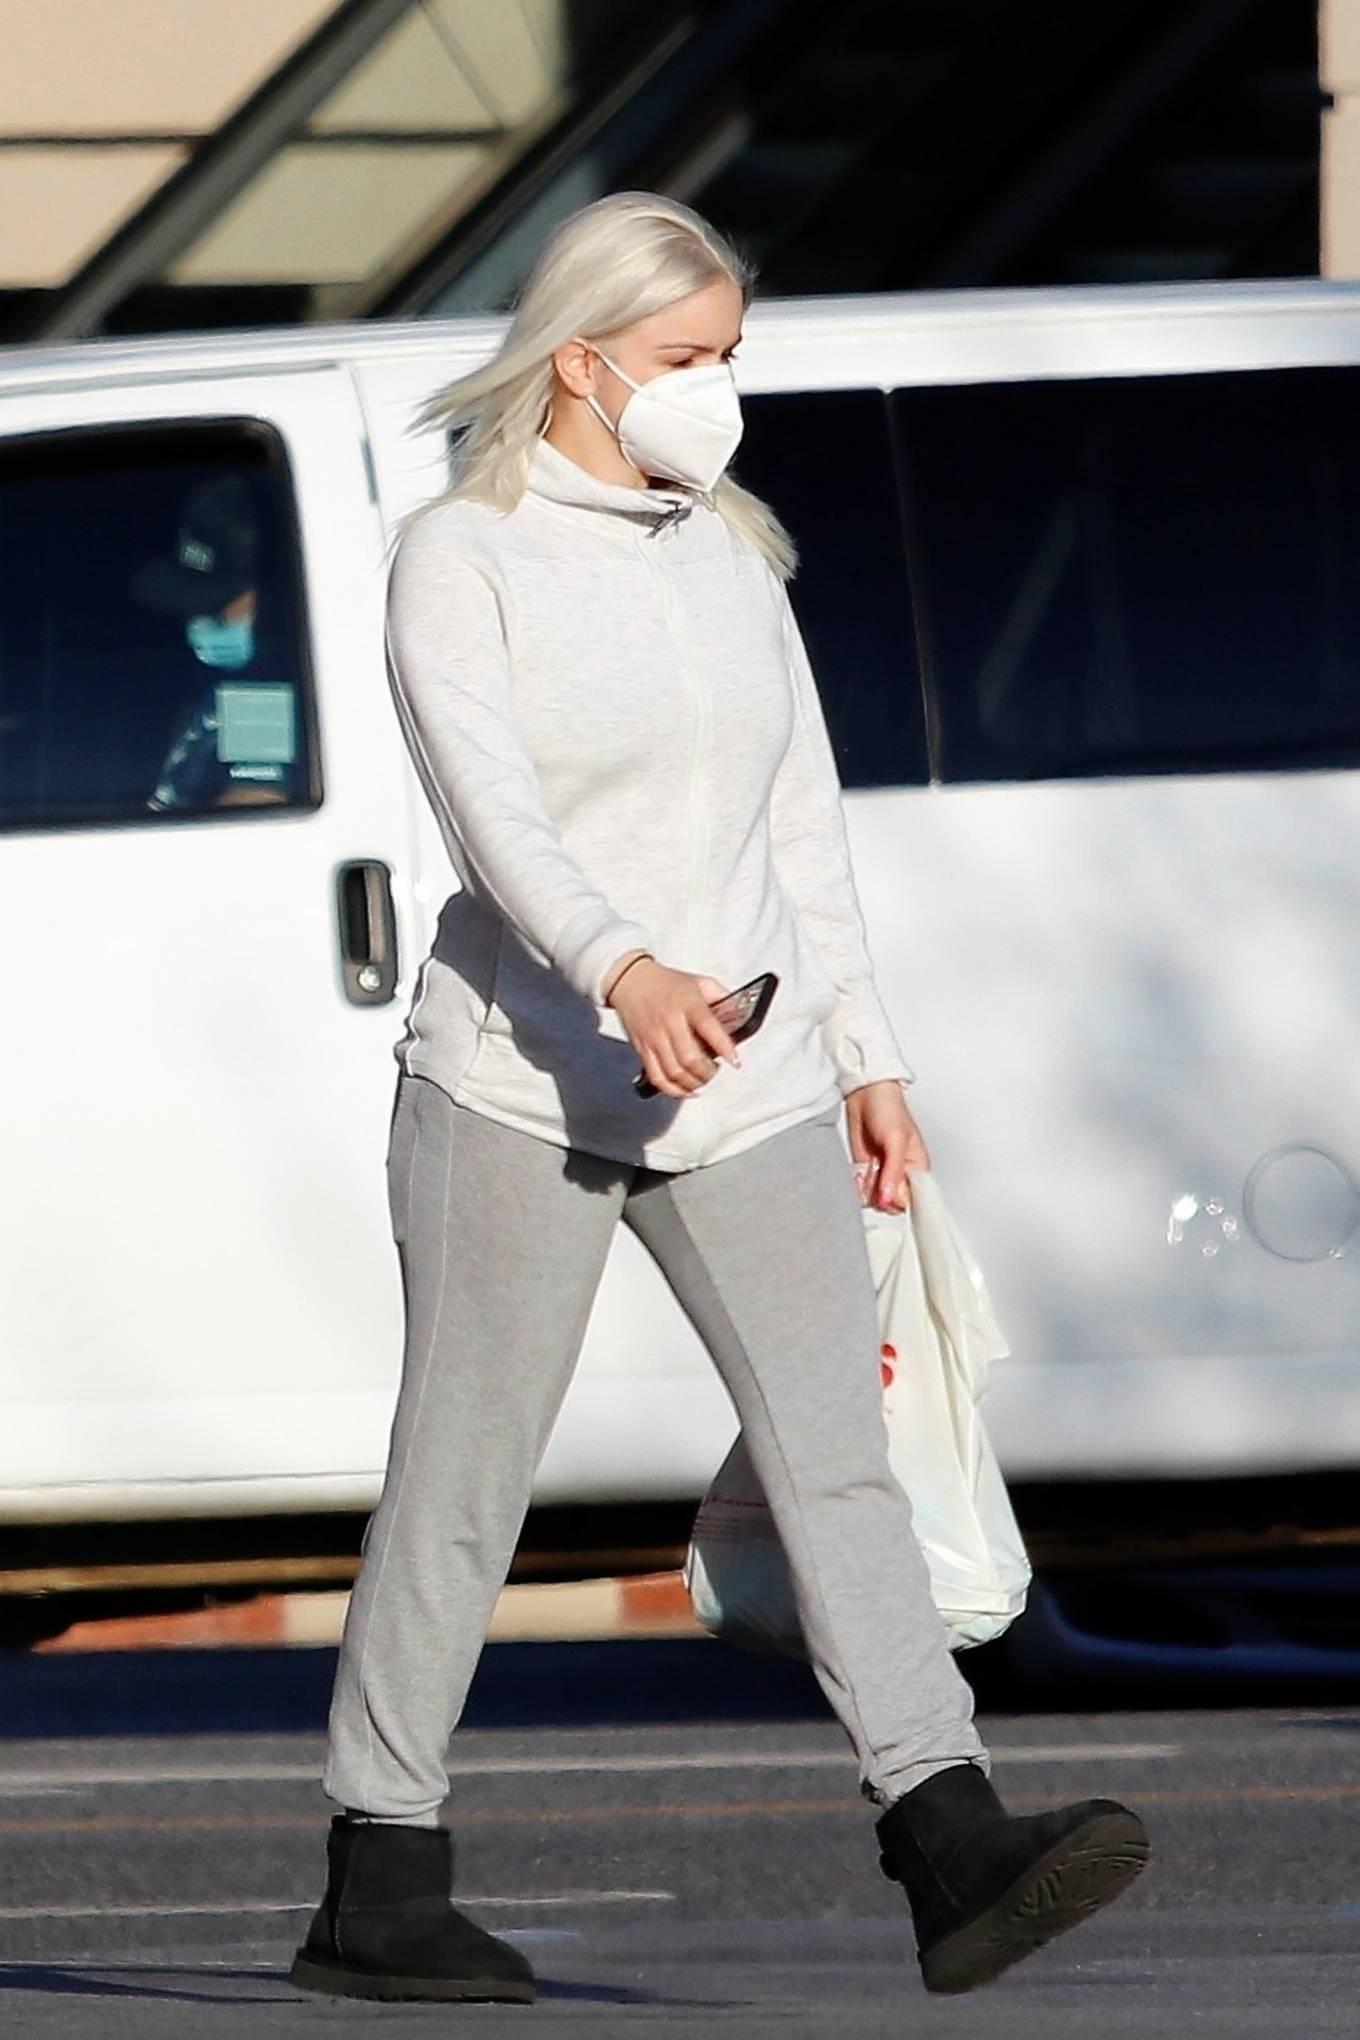 Ariel Winter - Seen after leaving the salon in Los Angeles